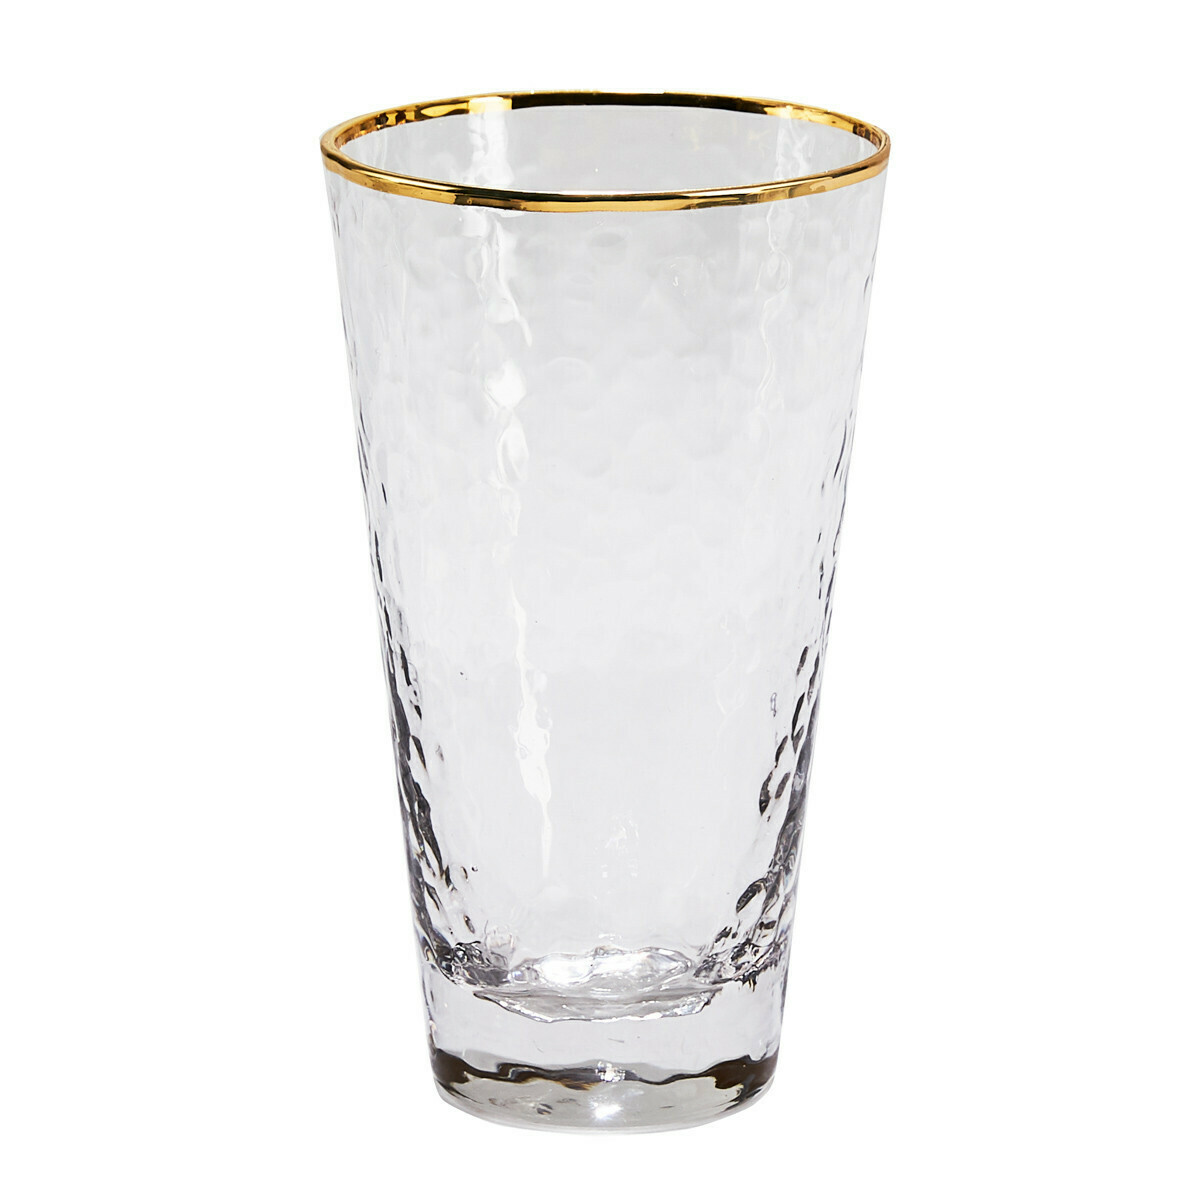 Gold Metallic Rim Highball Glass